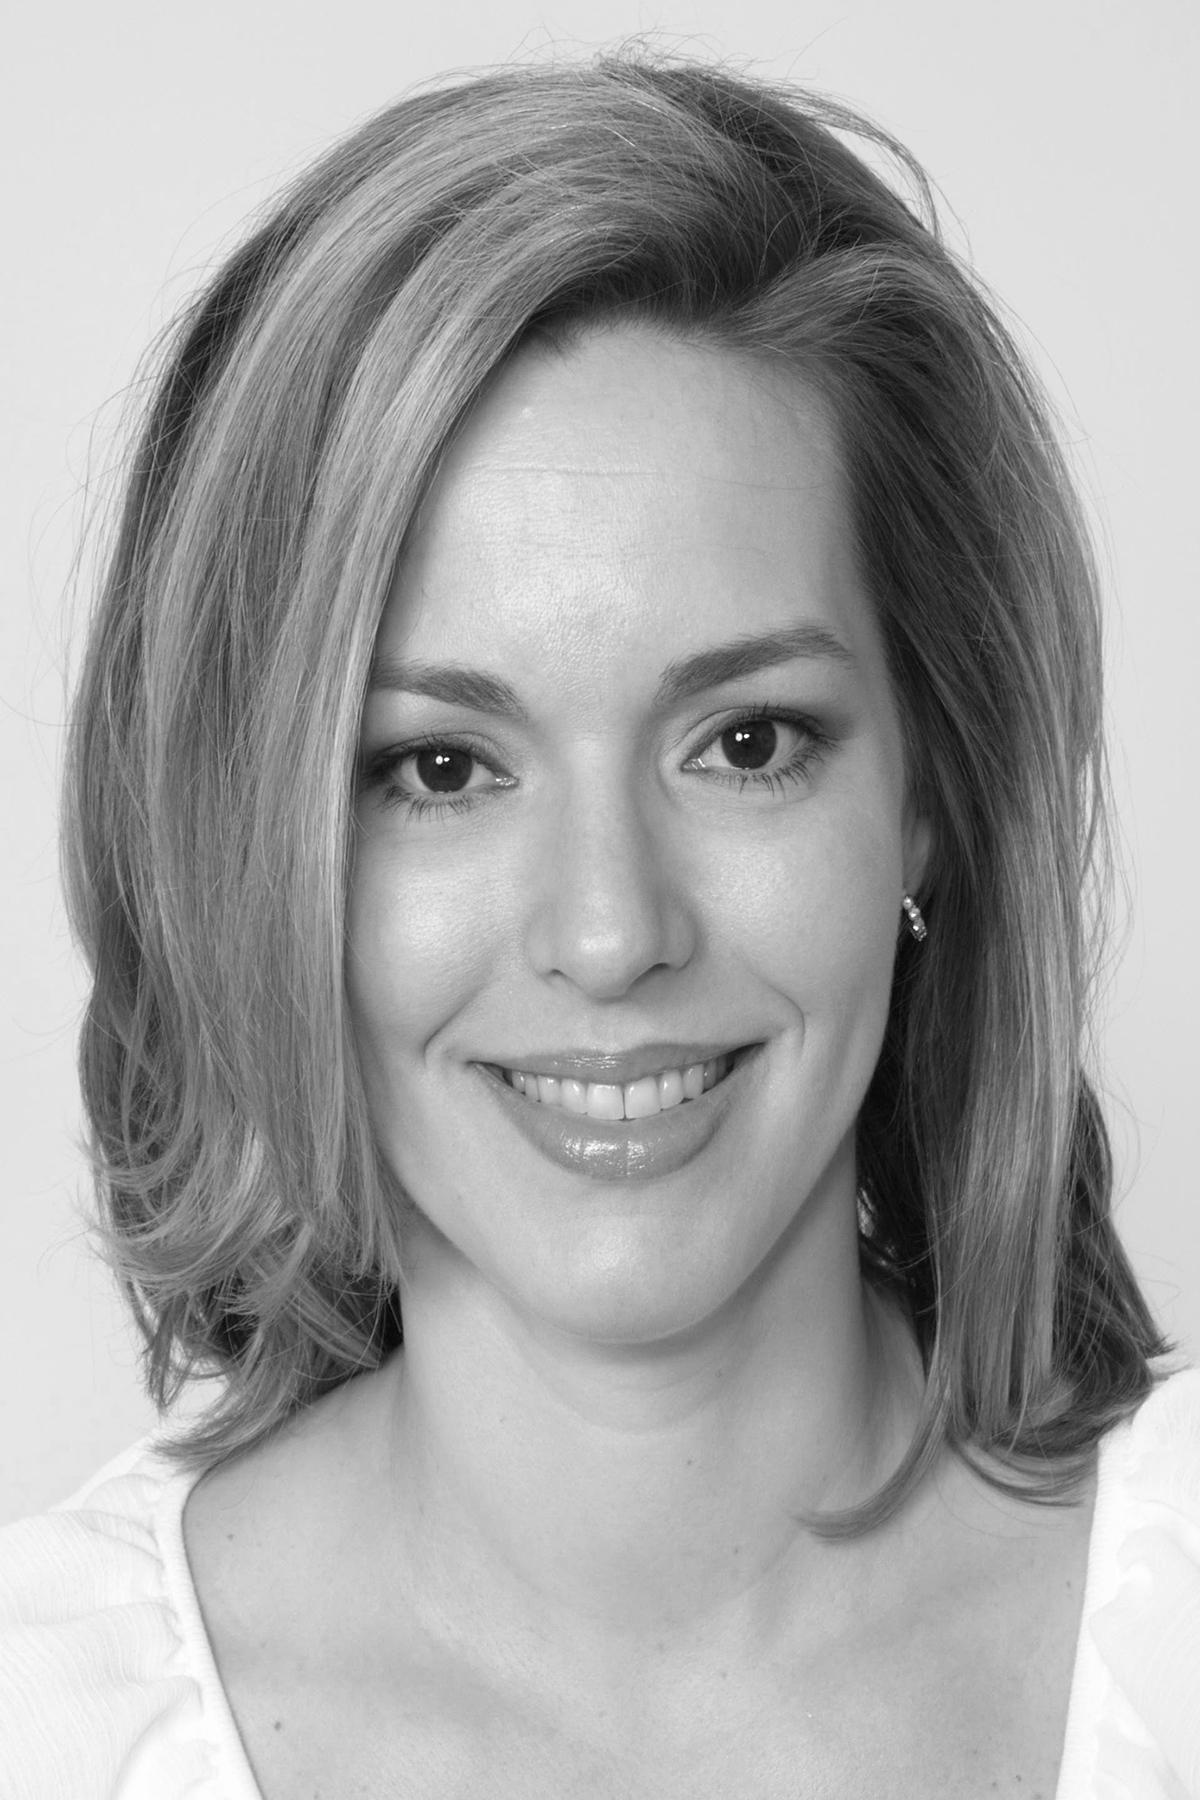 Danielle Spilatore